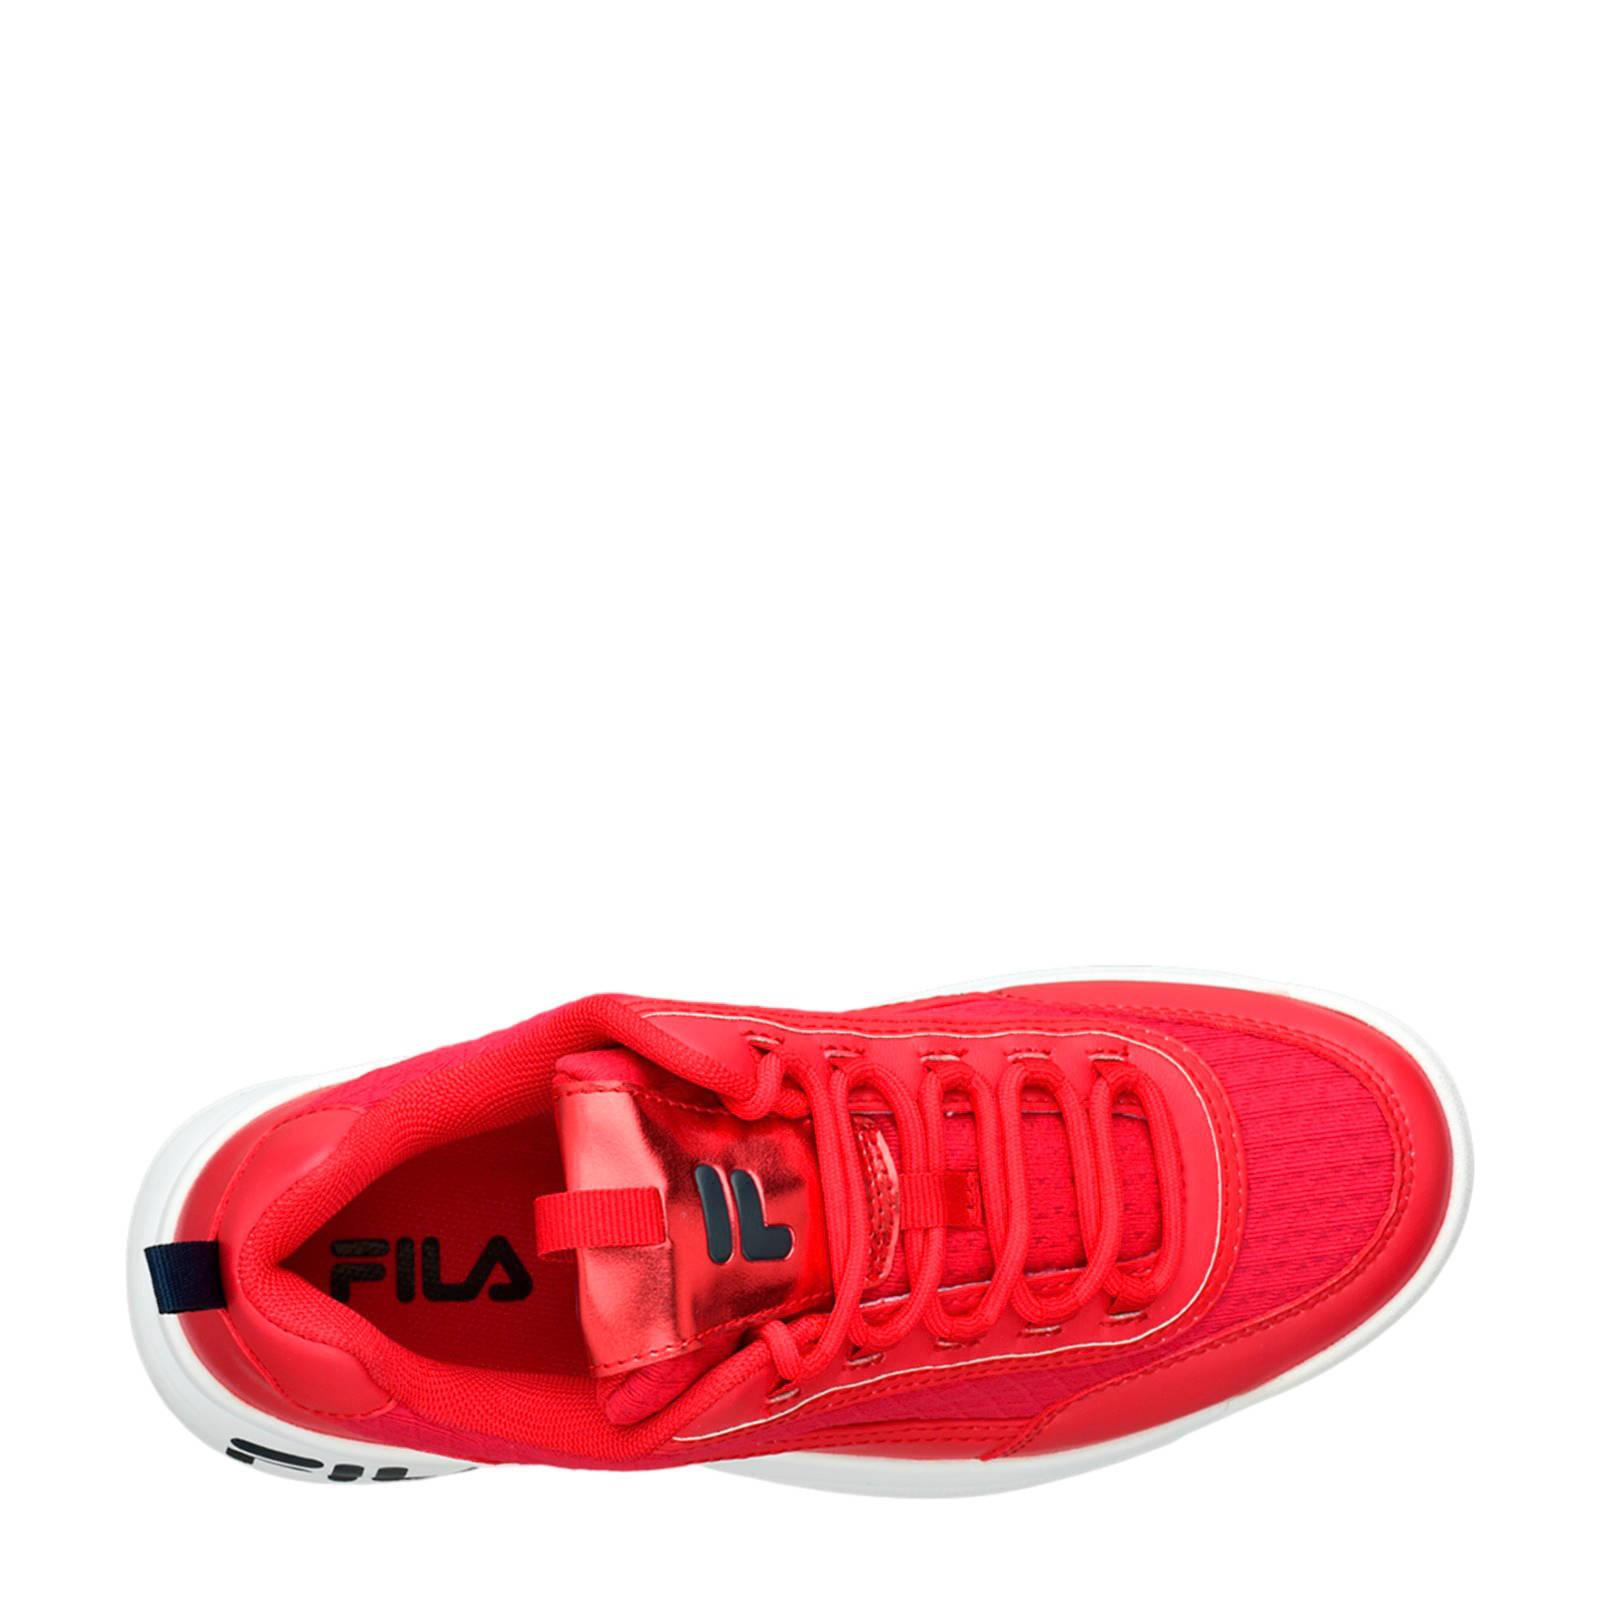 Fila chunky sneakers rood   wehkamp